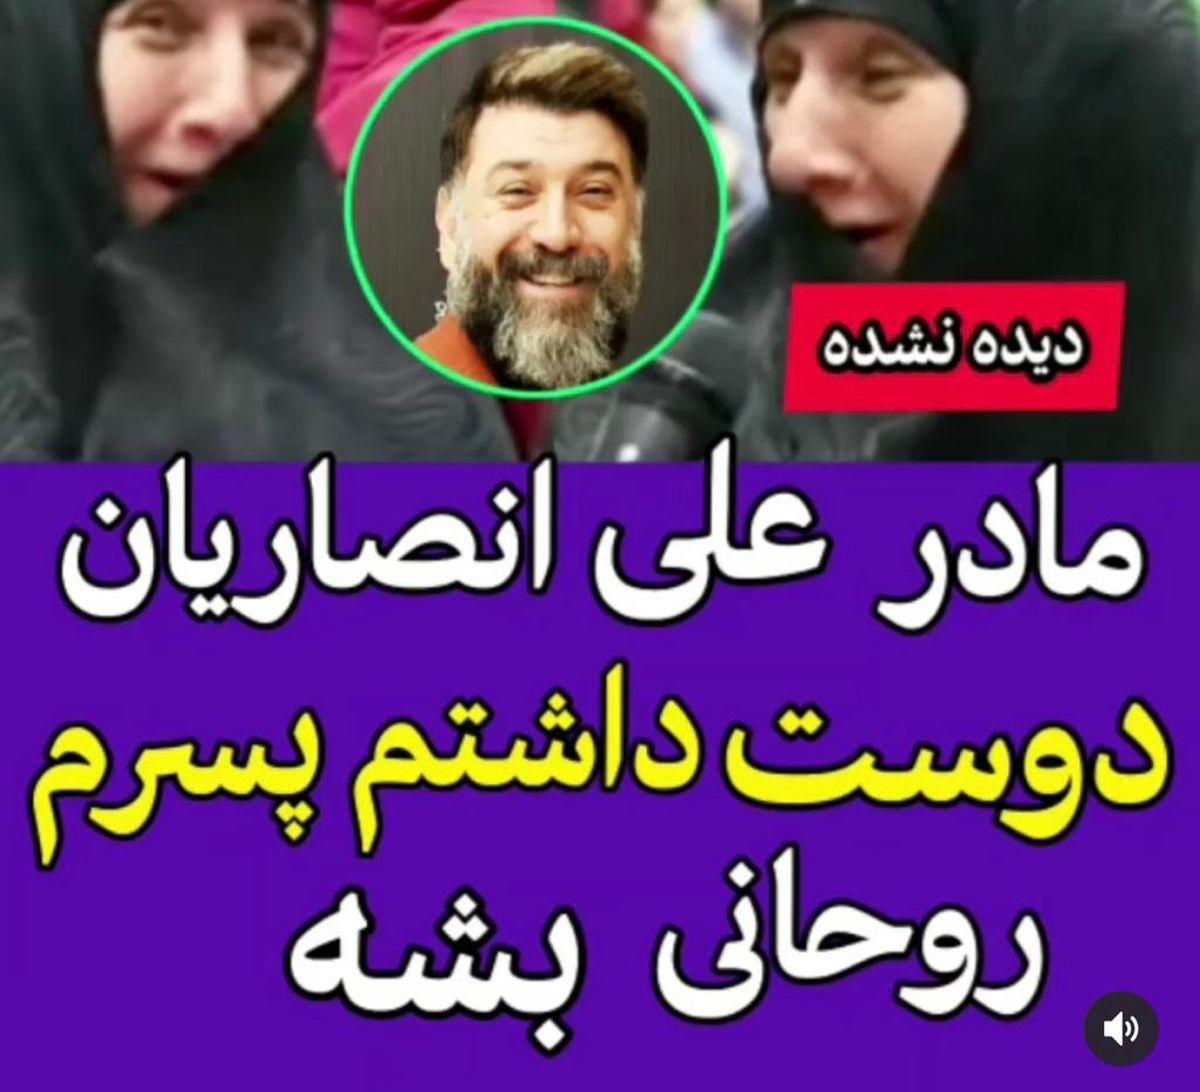 آرزوی مادر علی انصاریان که برآورده نشد + فیلم